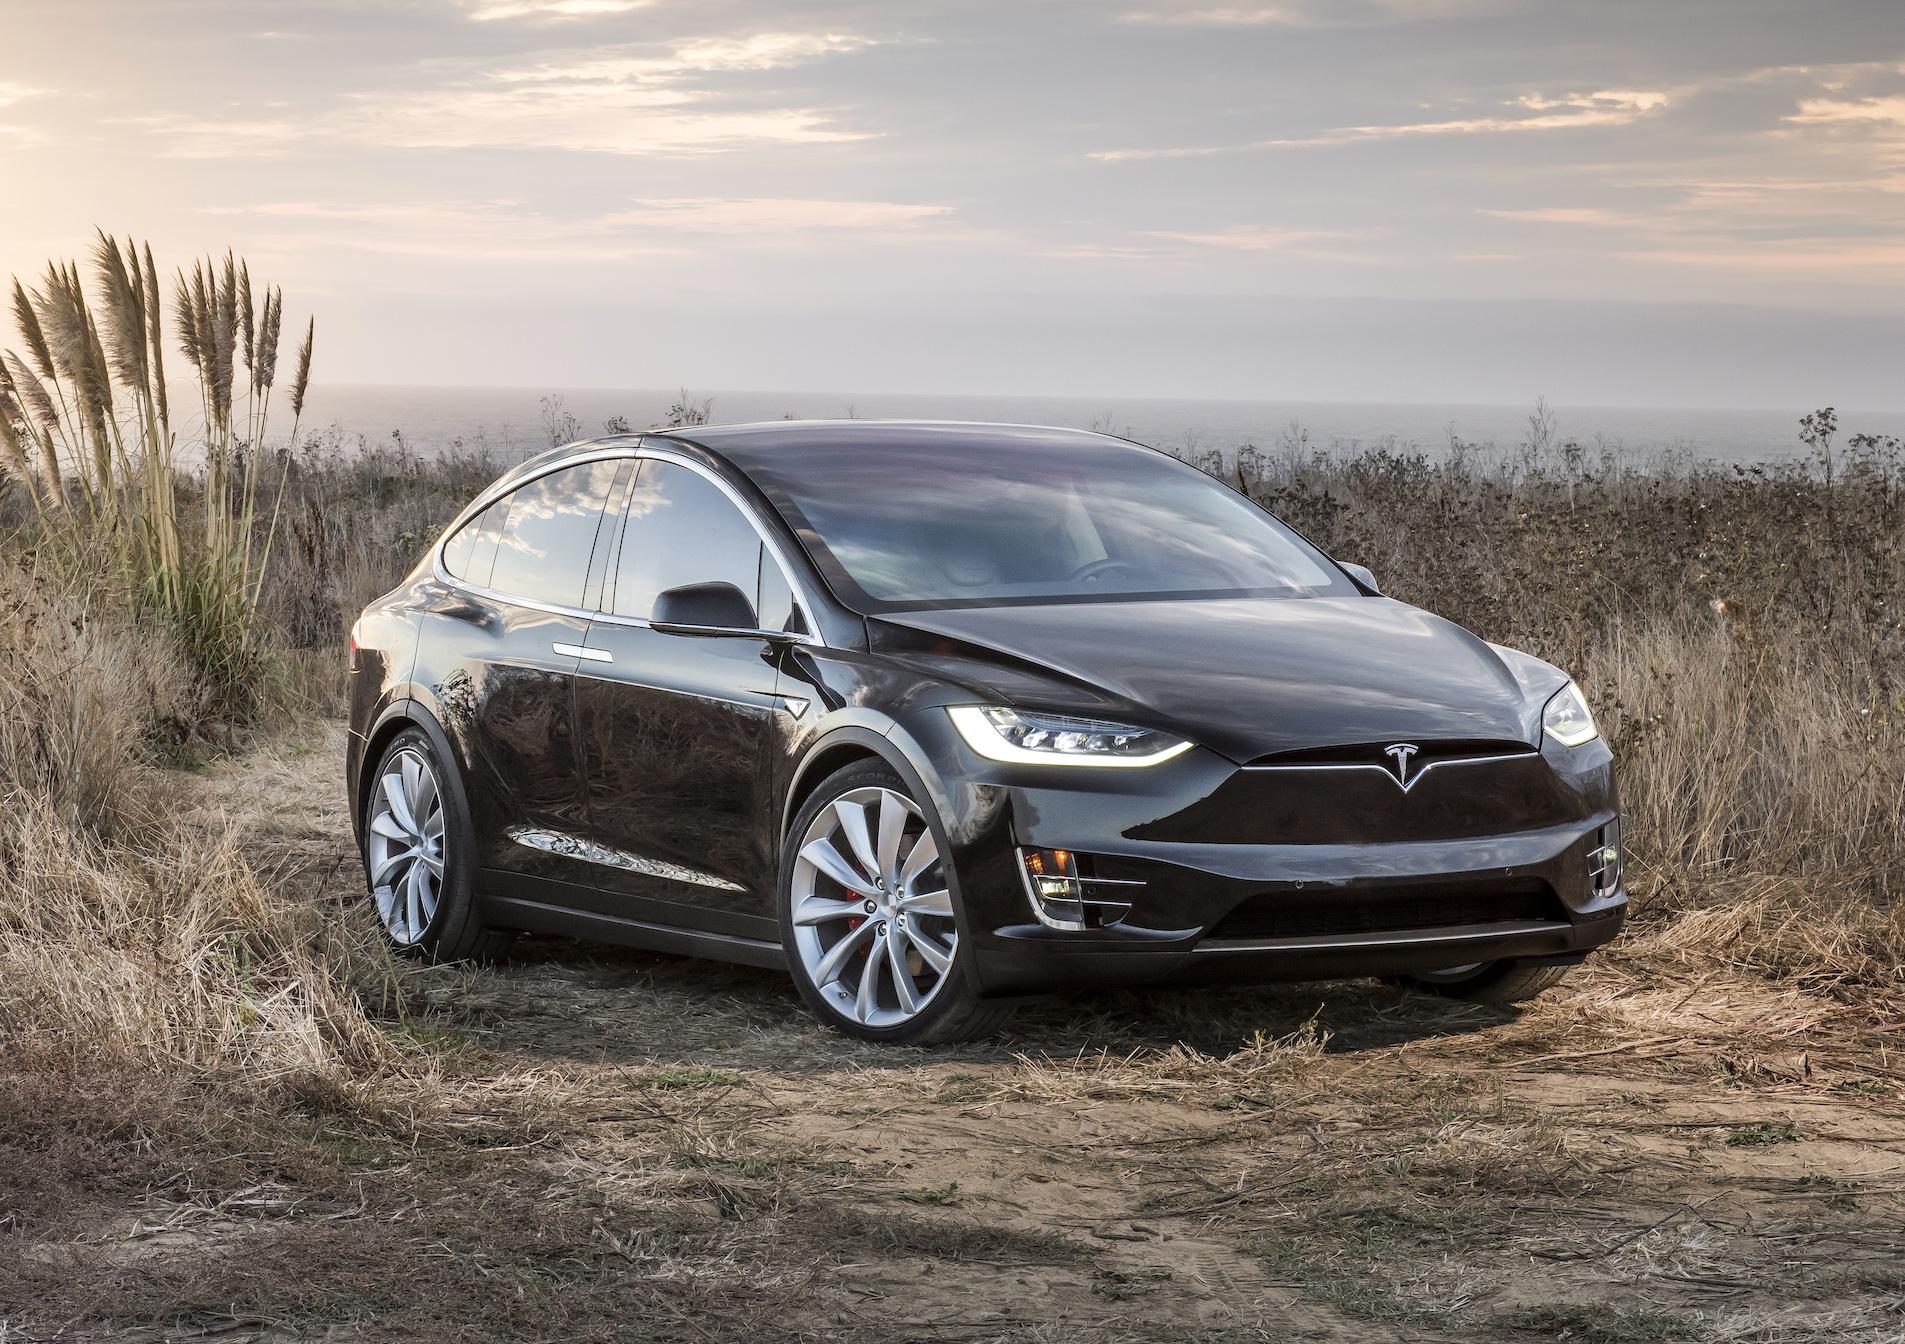 A black Tesla Model X, a 7-passenger luxury SUV.